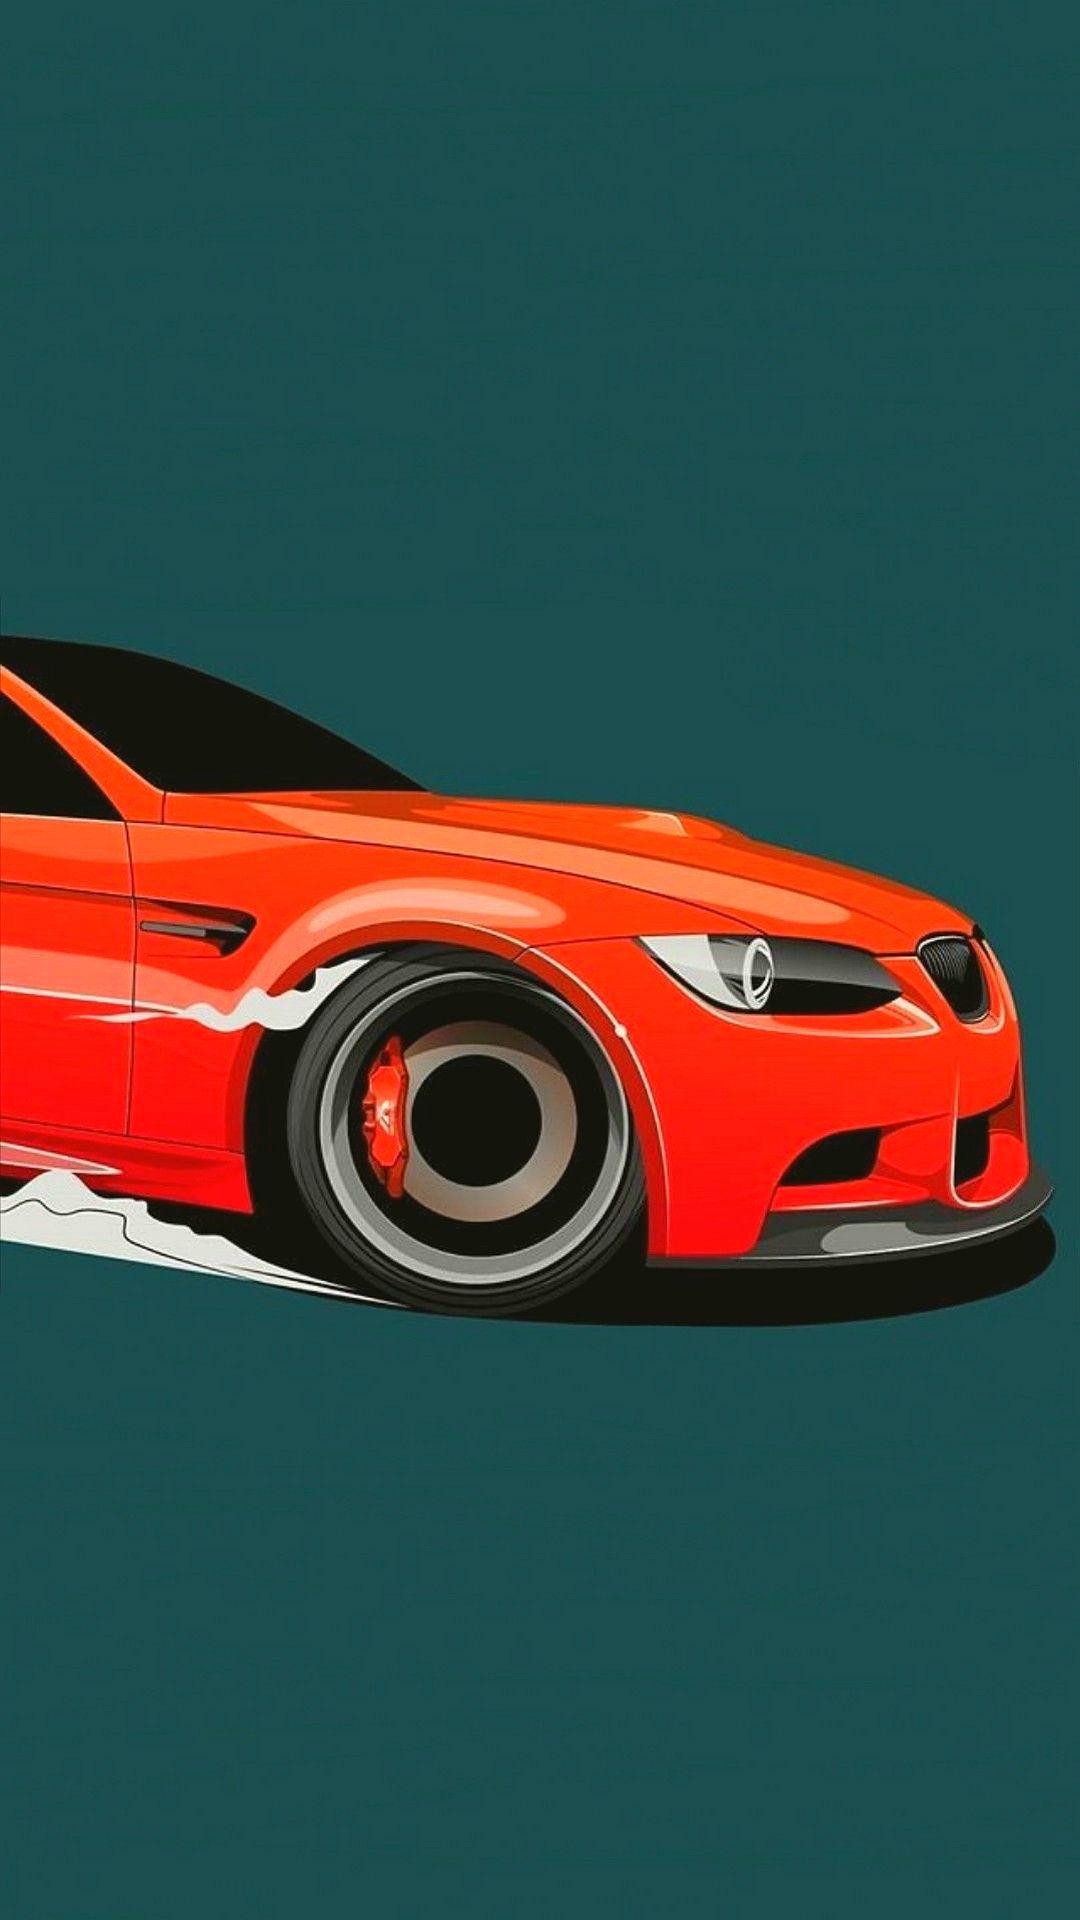 Mac, laptop, tablet, mobile phone. Car Minimalist Wallpaper 1080x1920 Car Wallpapers Car Iphone Wallpaper Bmw